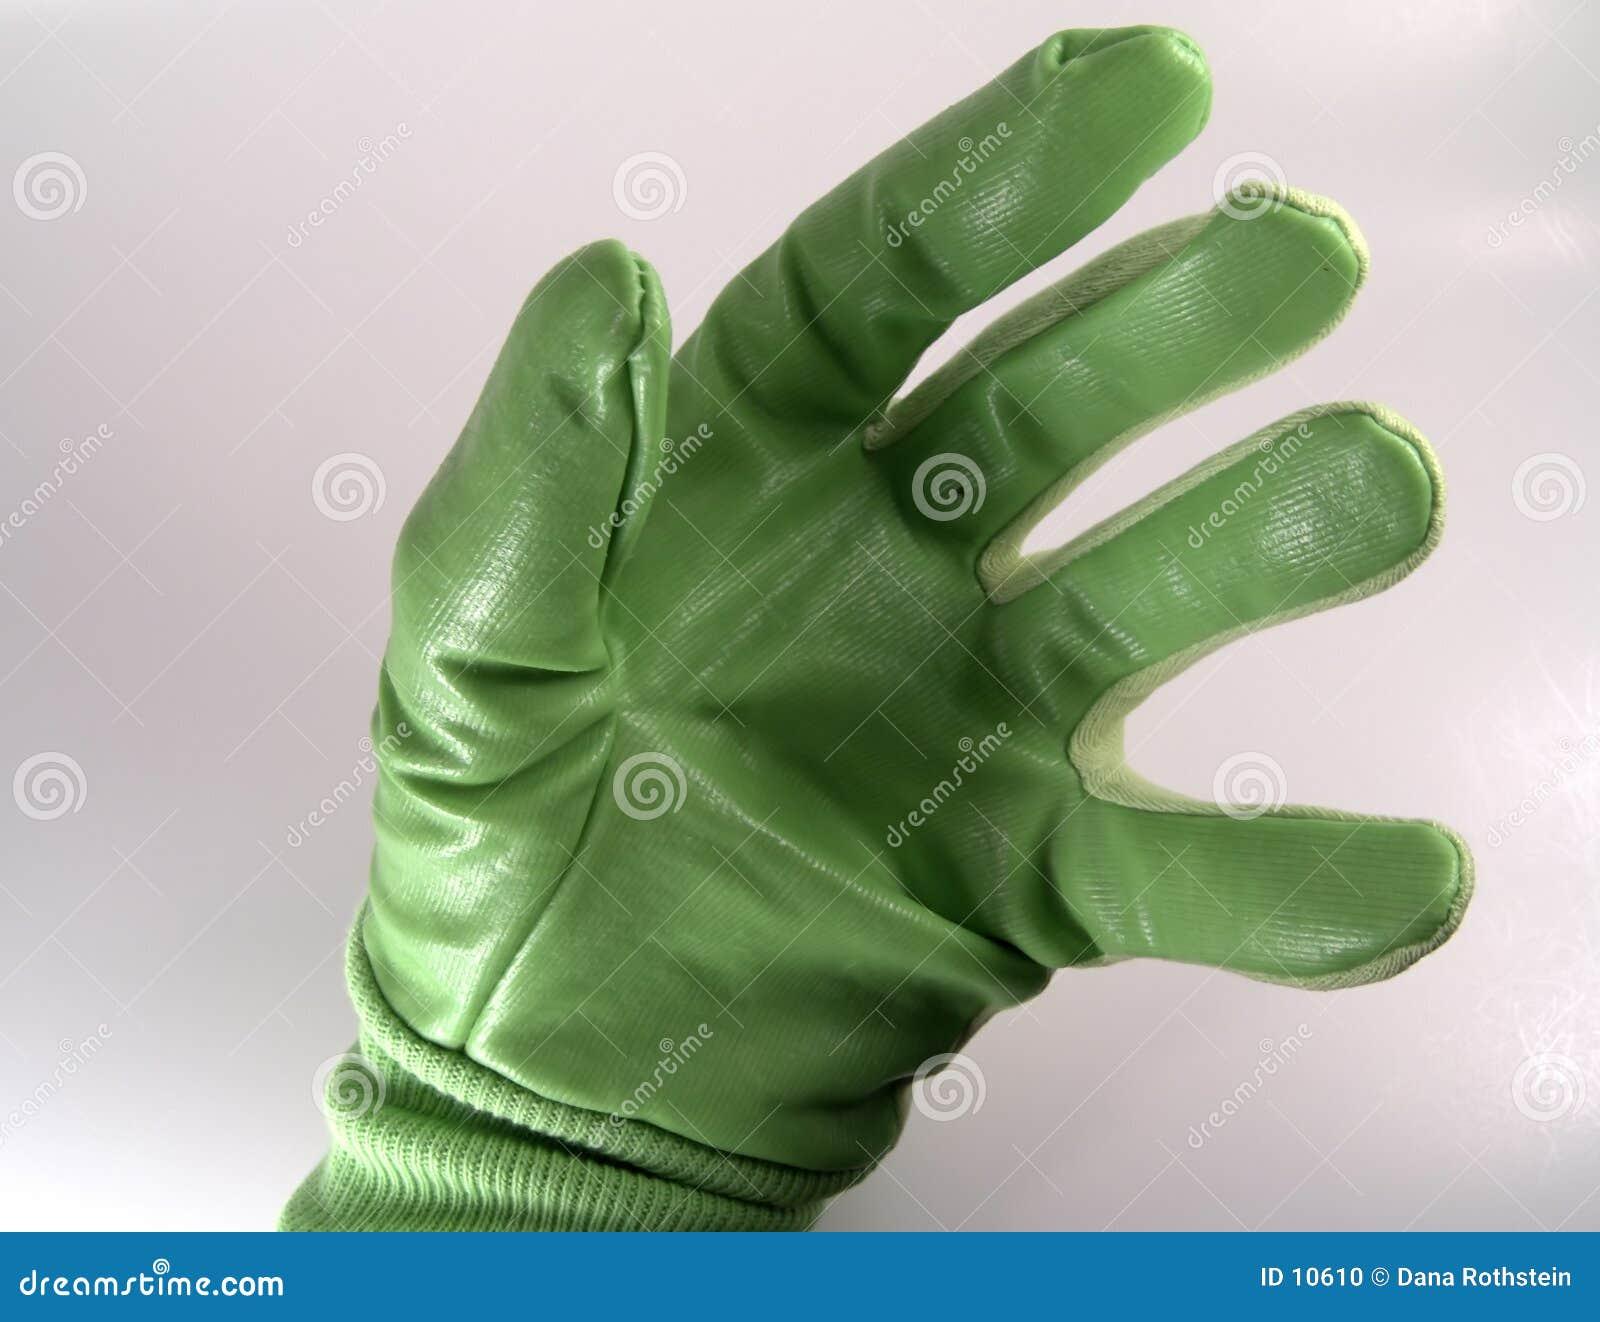 Hand in Green Glove